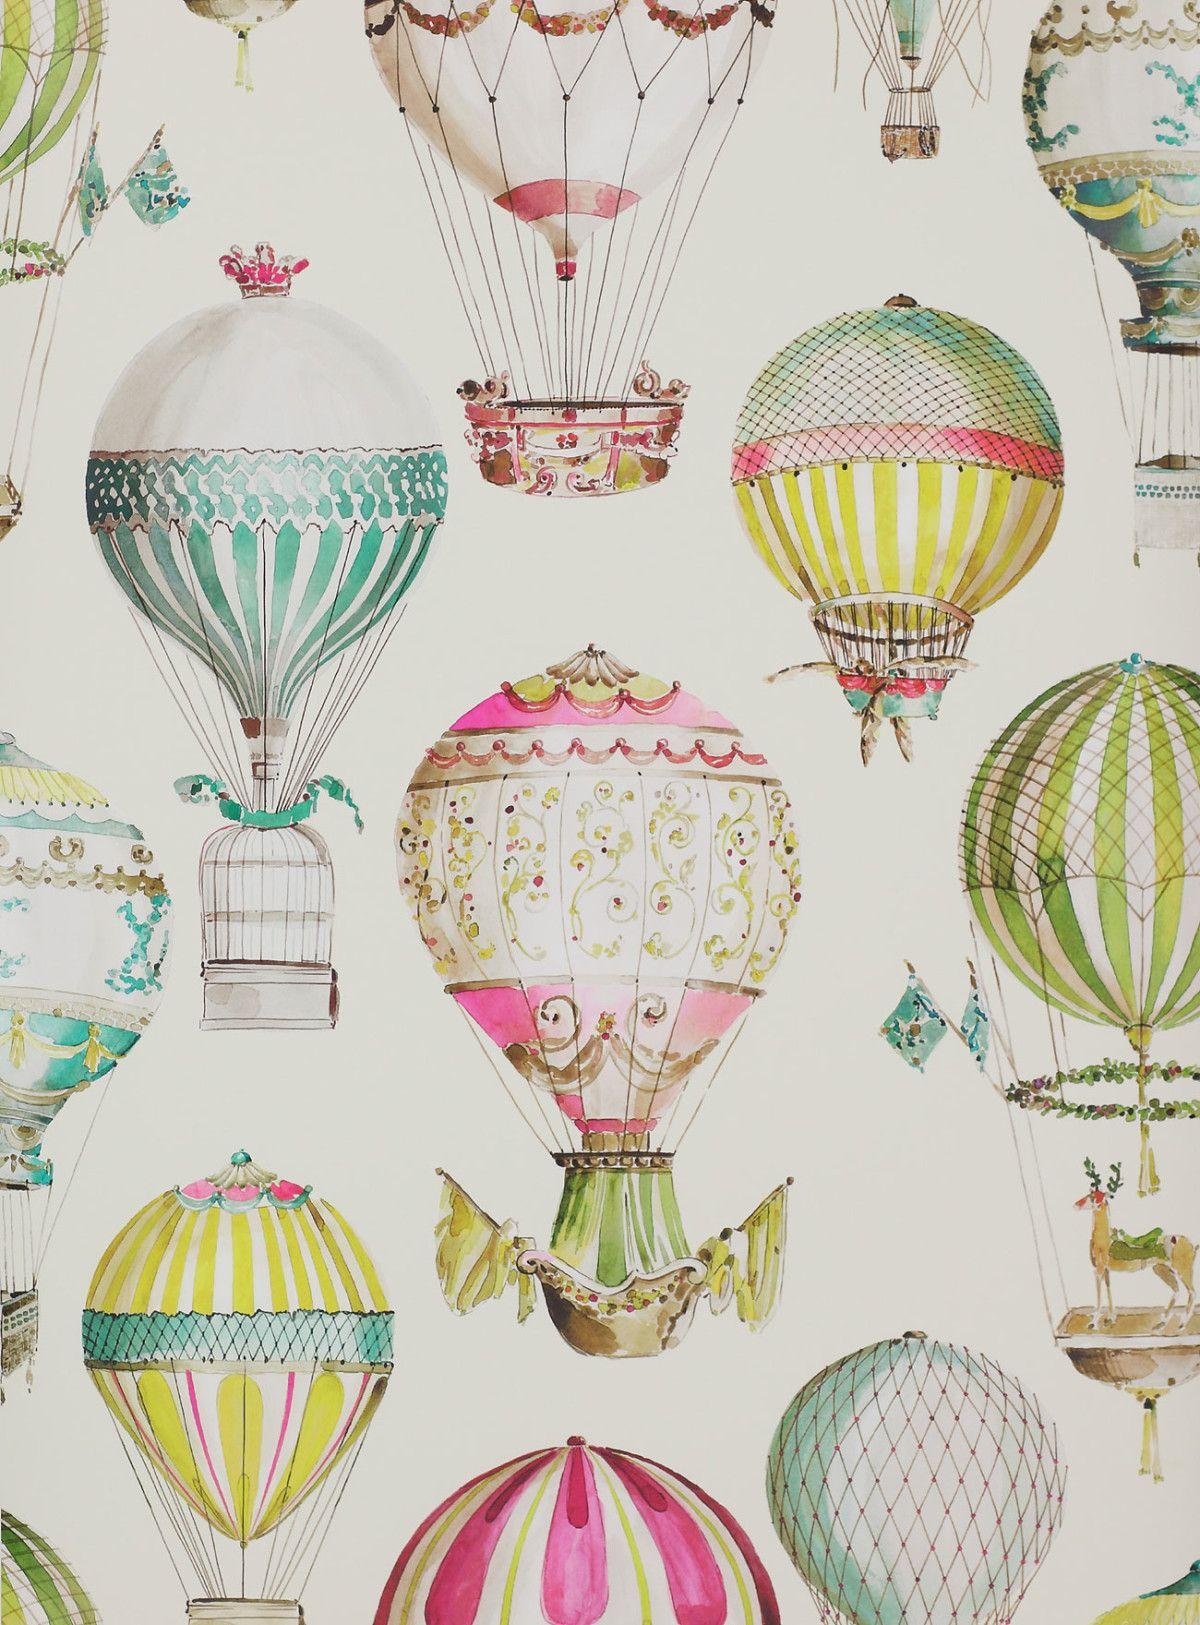 Blutezeit Ballon Illustration Tapeten Und Farben Und Tapeten